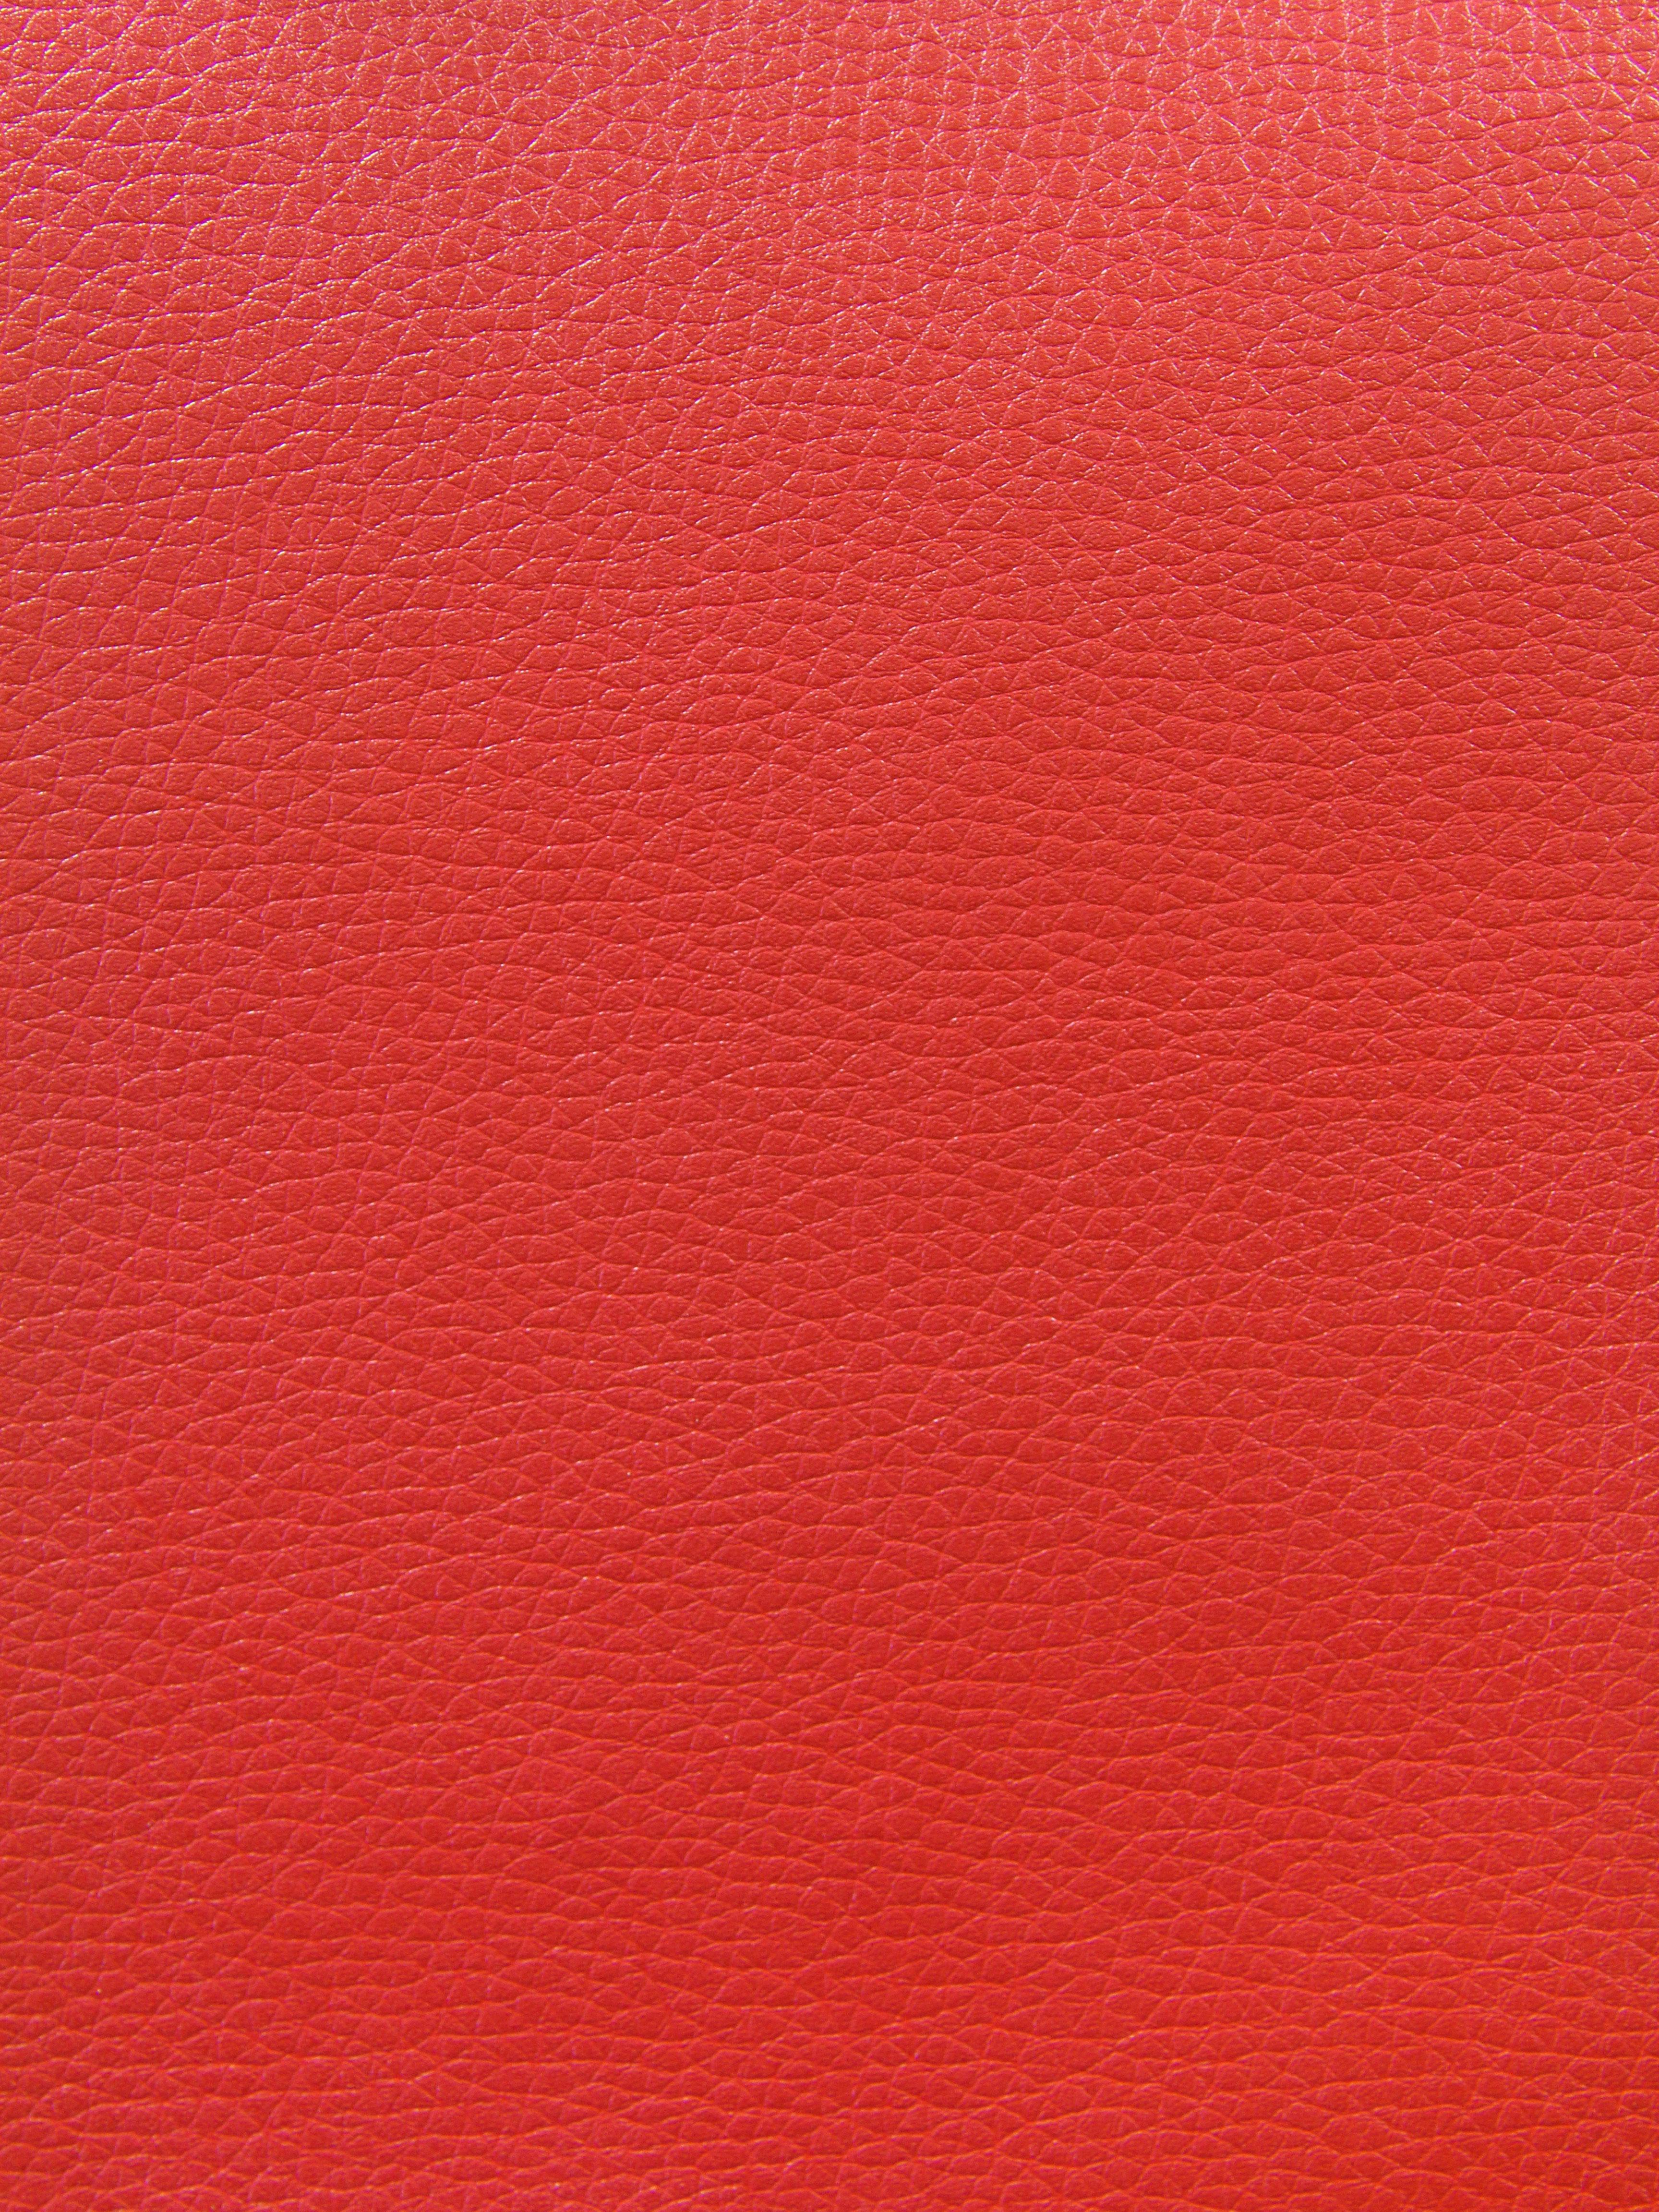 sony xperia wallpaper hd free download